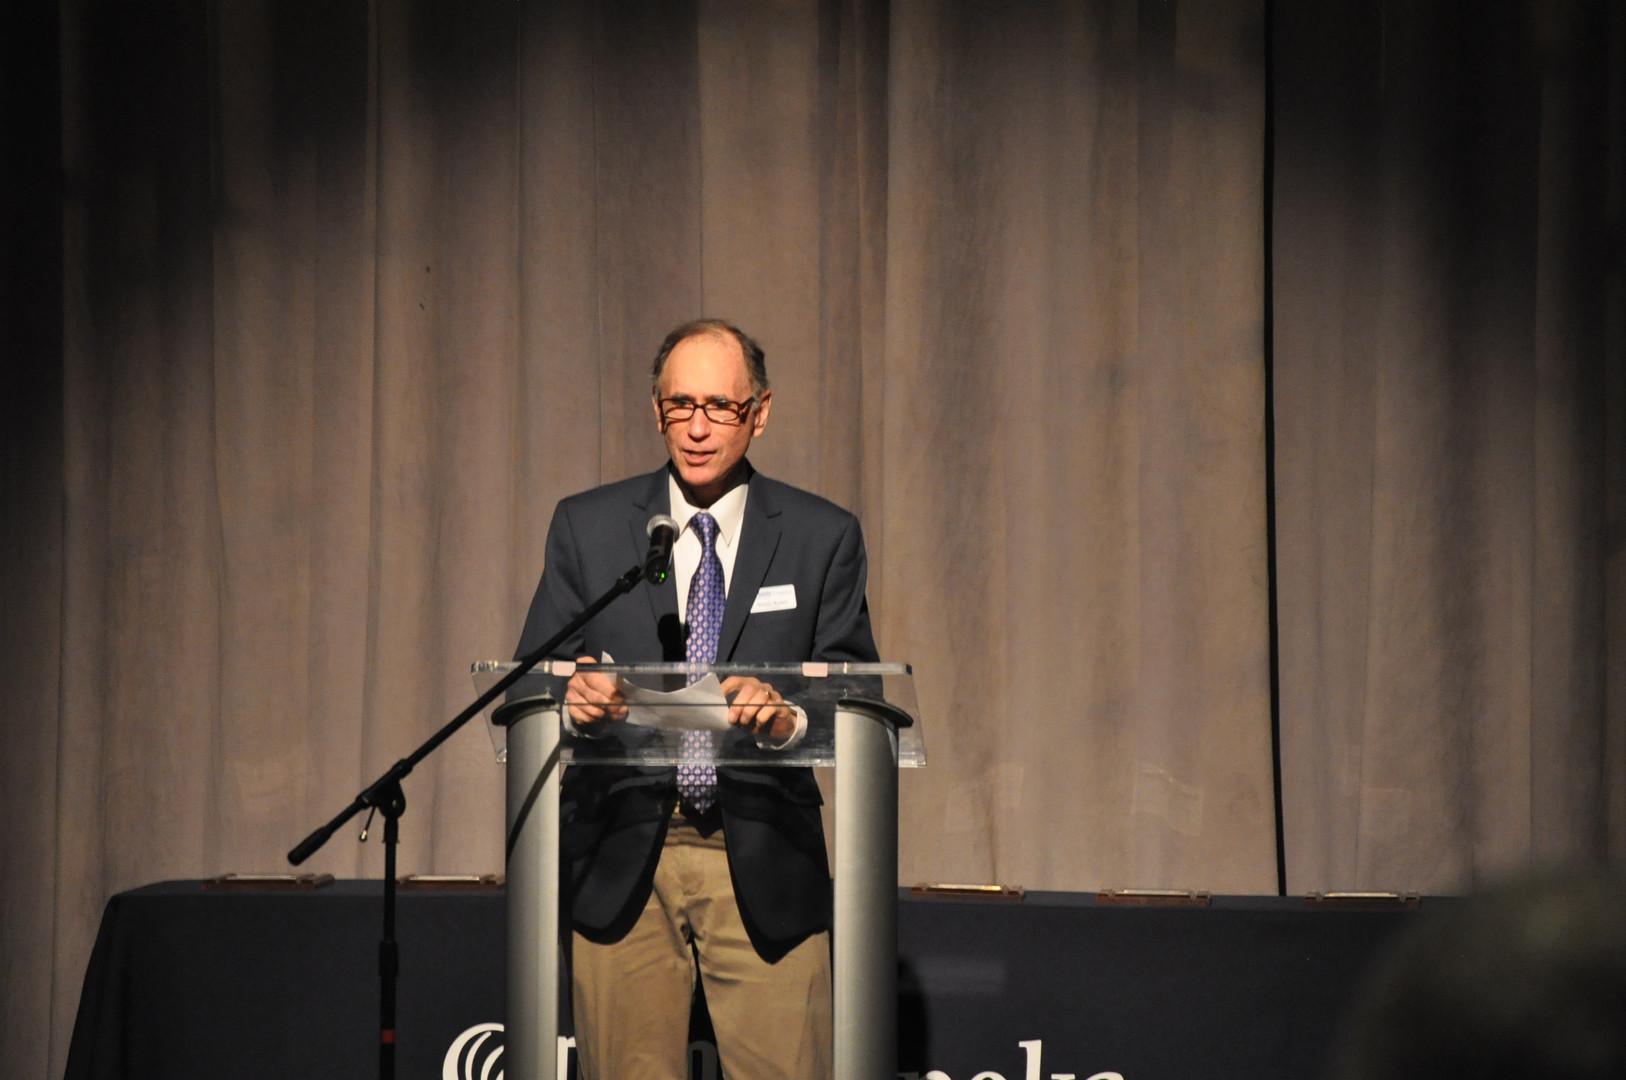 Dennis Bosley NAMI Topeka Board member